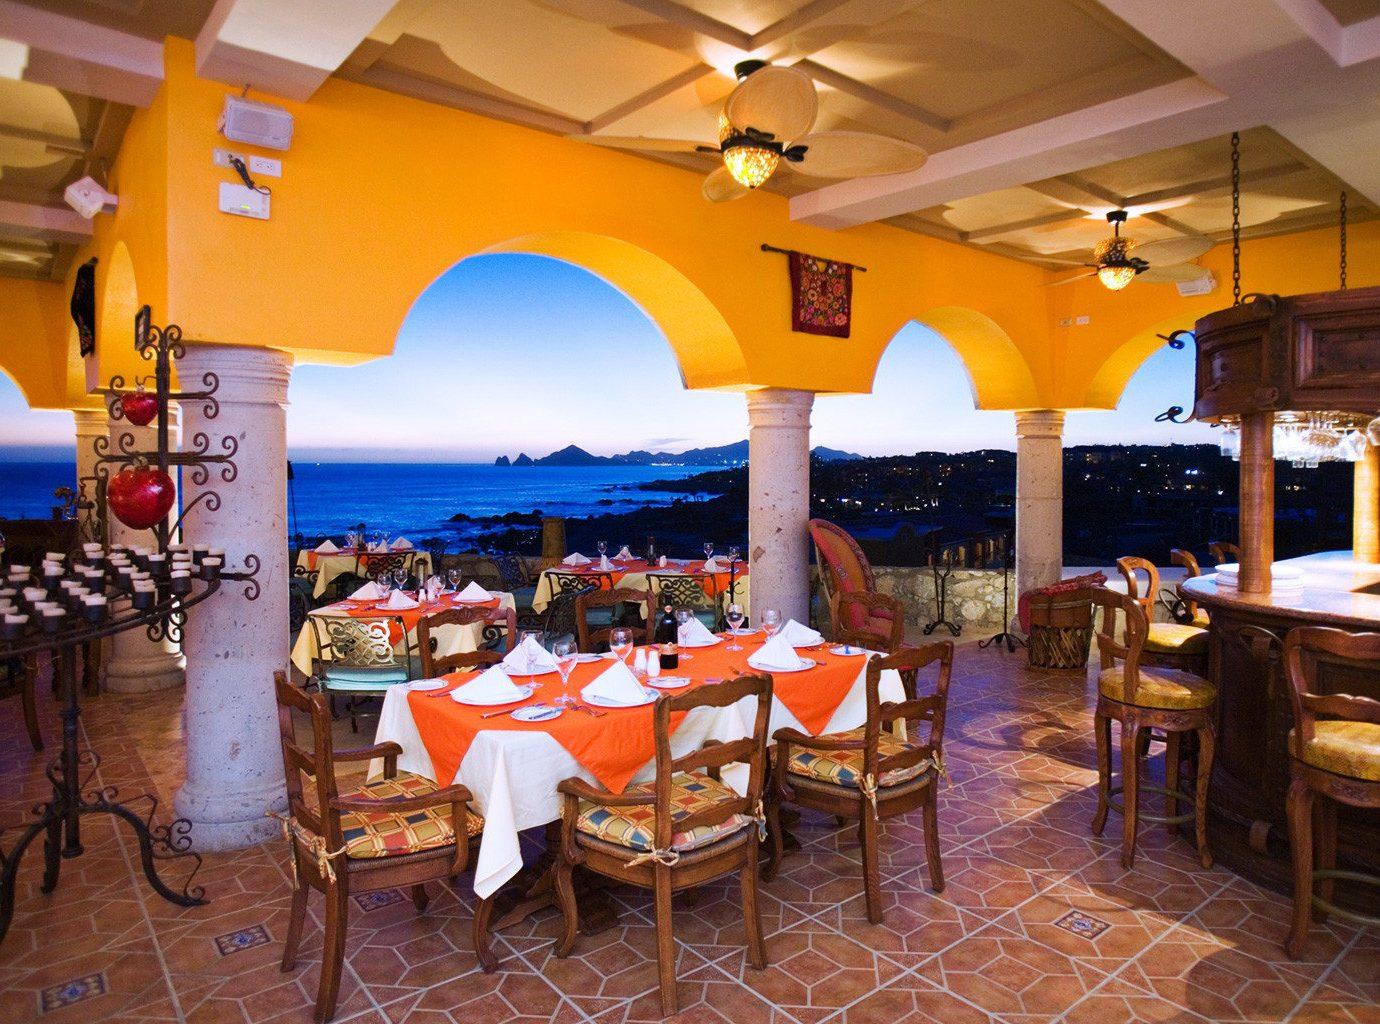 Beachfront Dining at Hacienda Encantada Resort